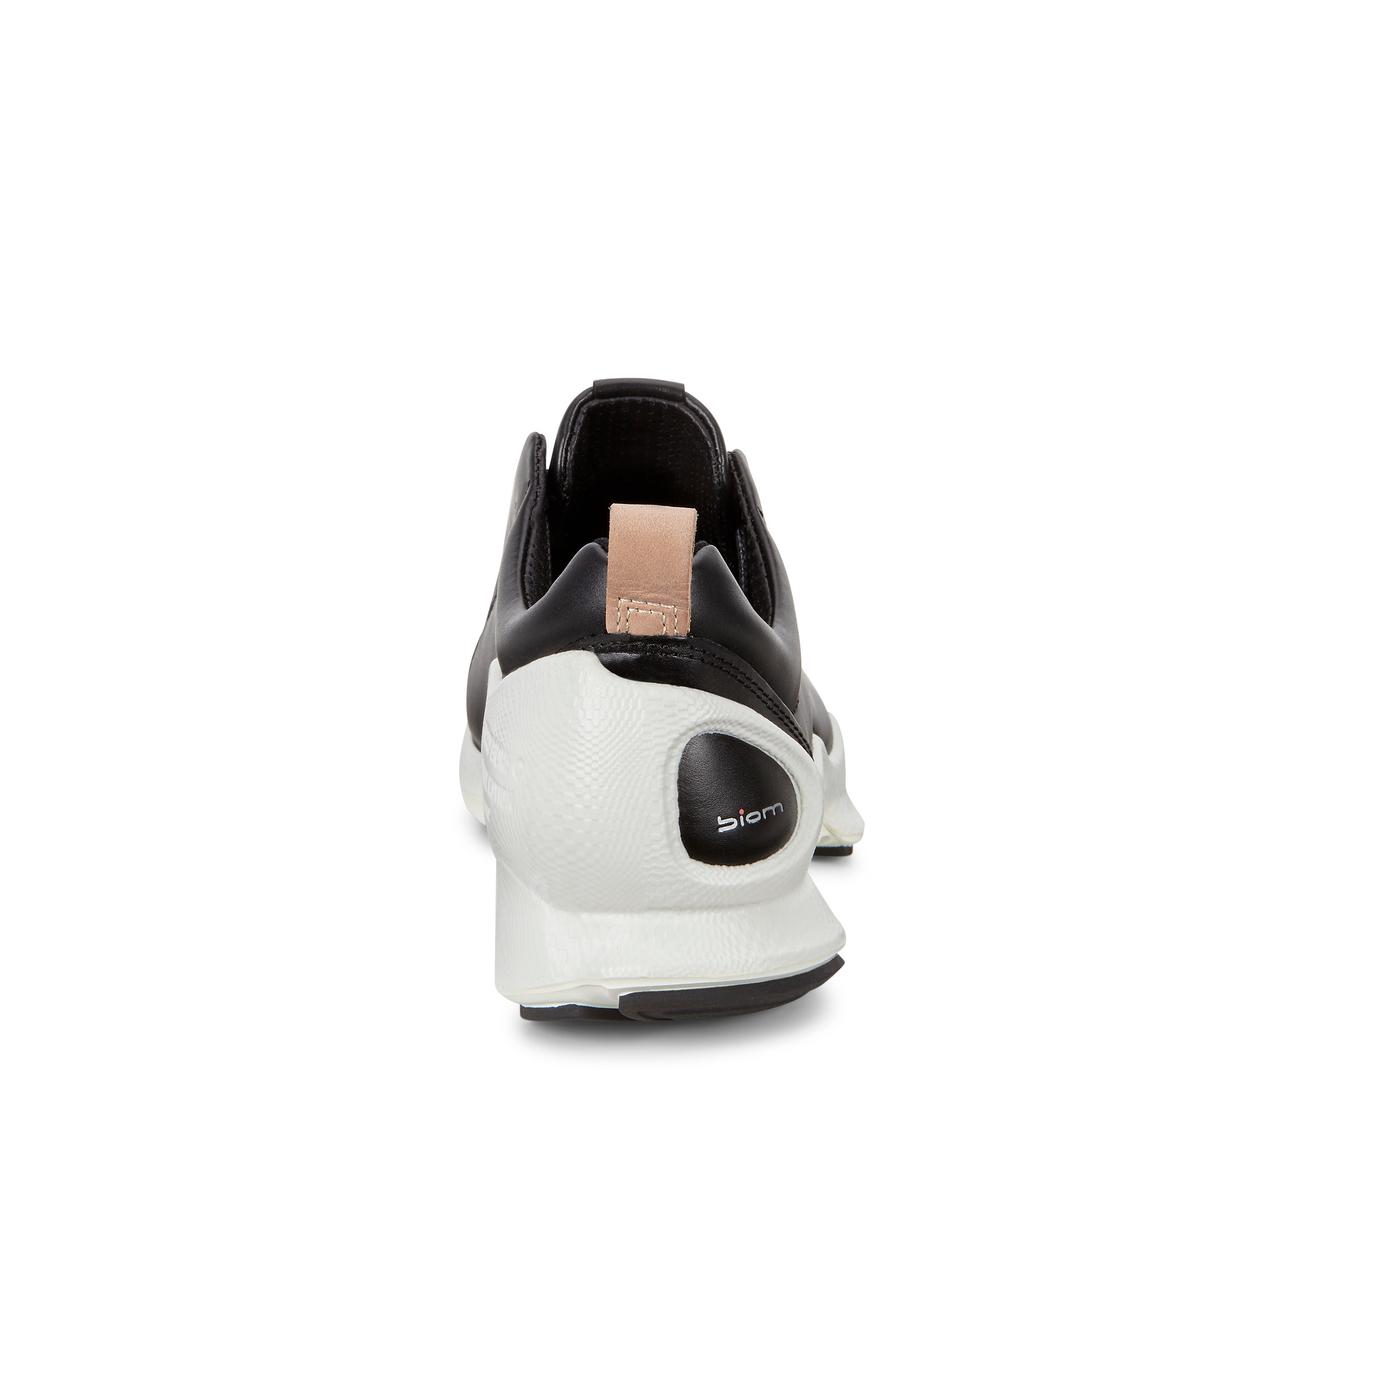 ECCO BIOM C Womens Premium Youthful Sneaker